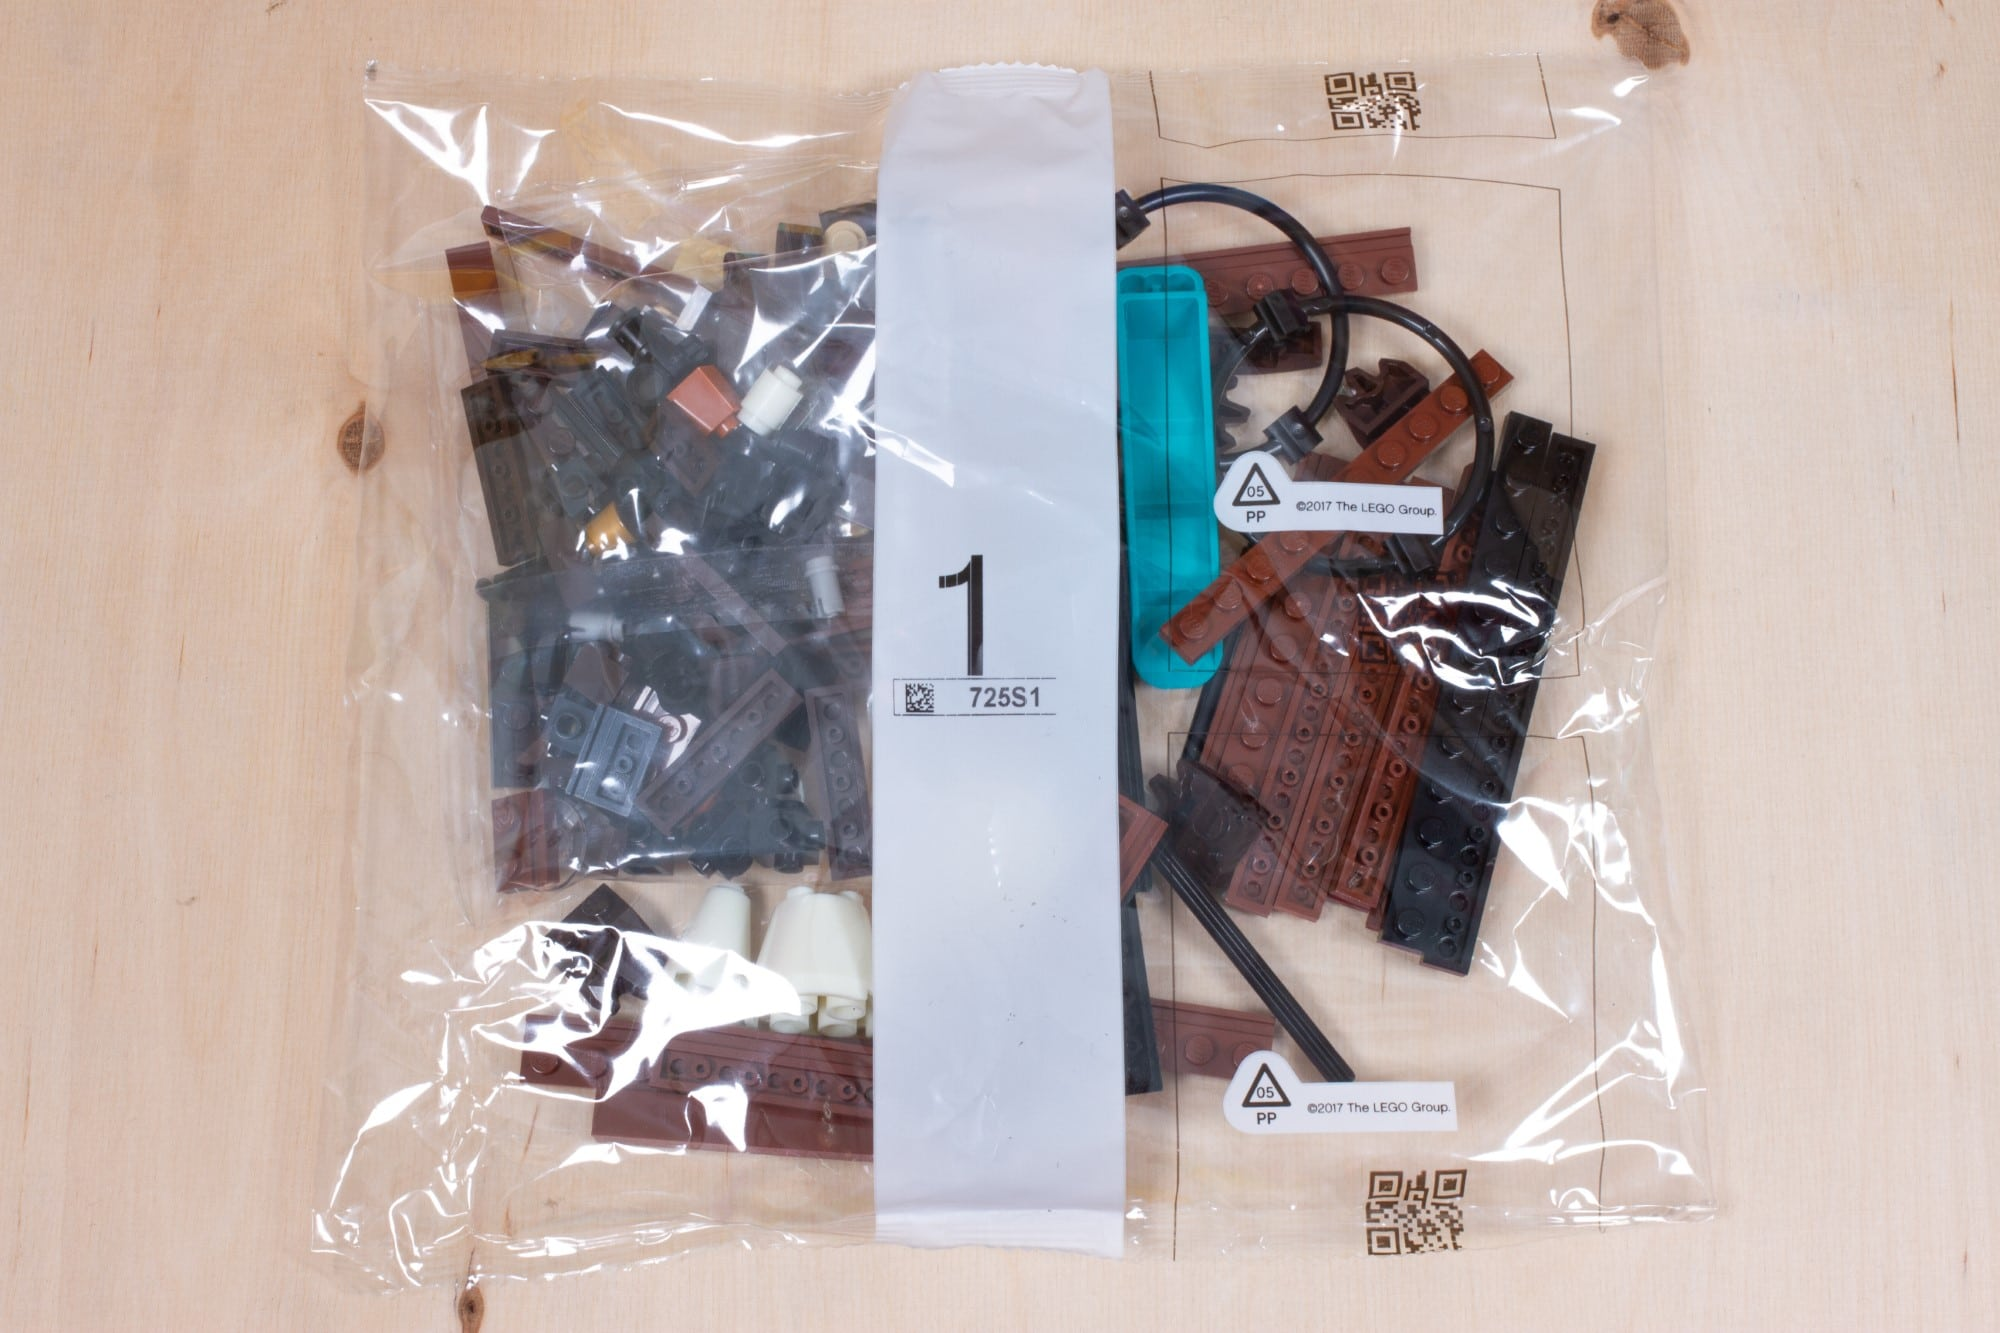 LEGO 76391 Hogwarts Icons Review Unboxing 1 Schritt 1